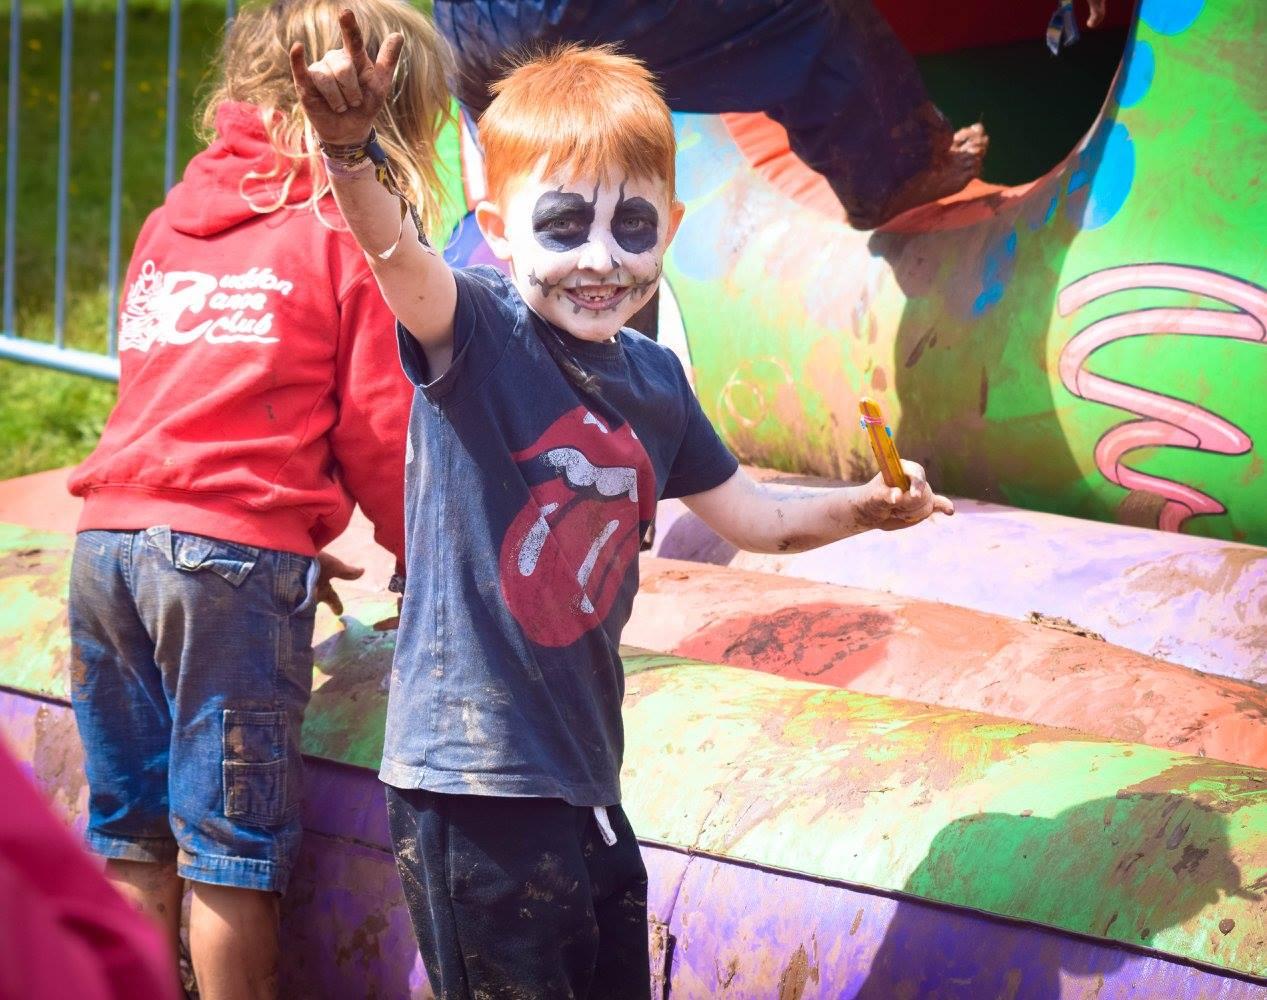 Sonny at a festival